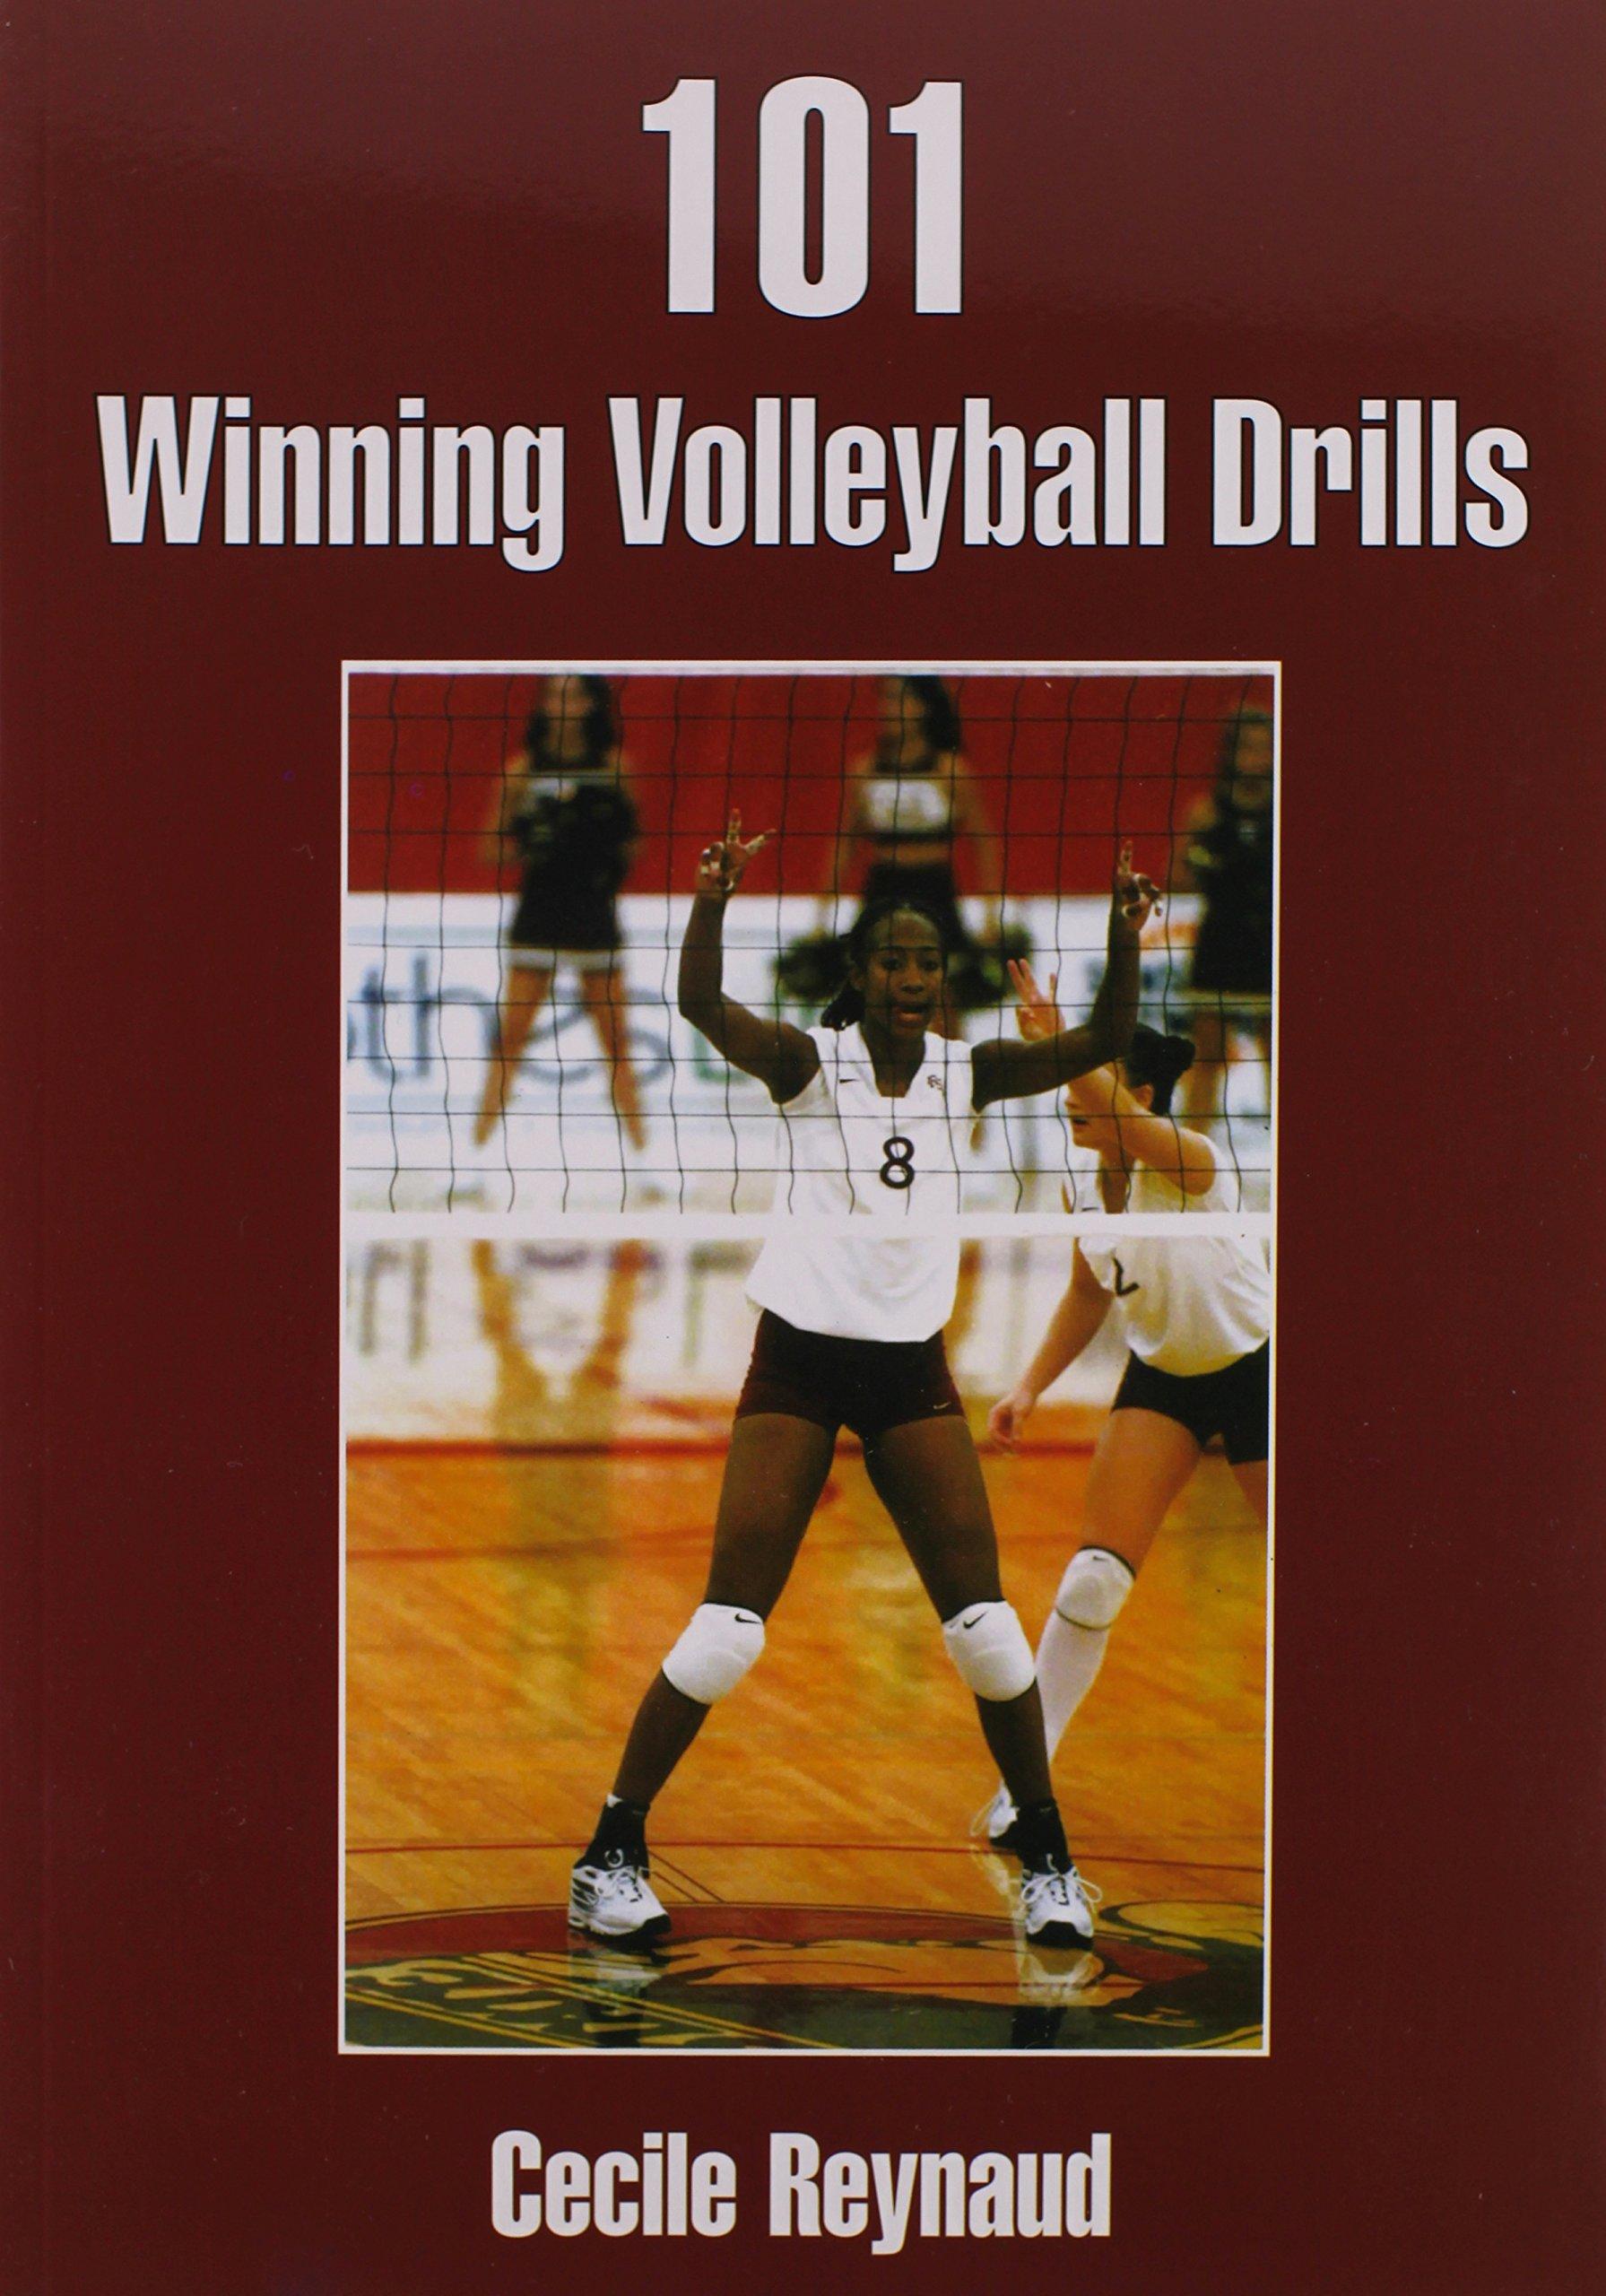 101 Winning Volleyball Drills: Cecile Reynaud: 9781585180837: Amazon.com:  Books